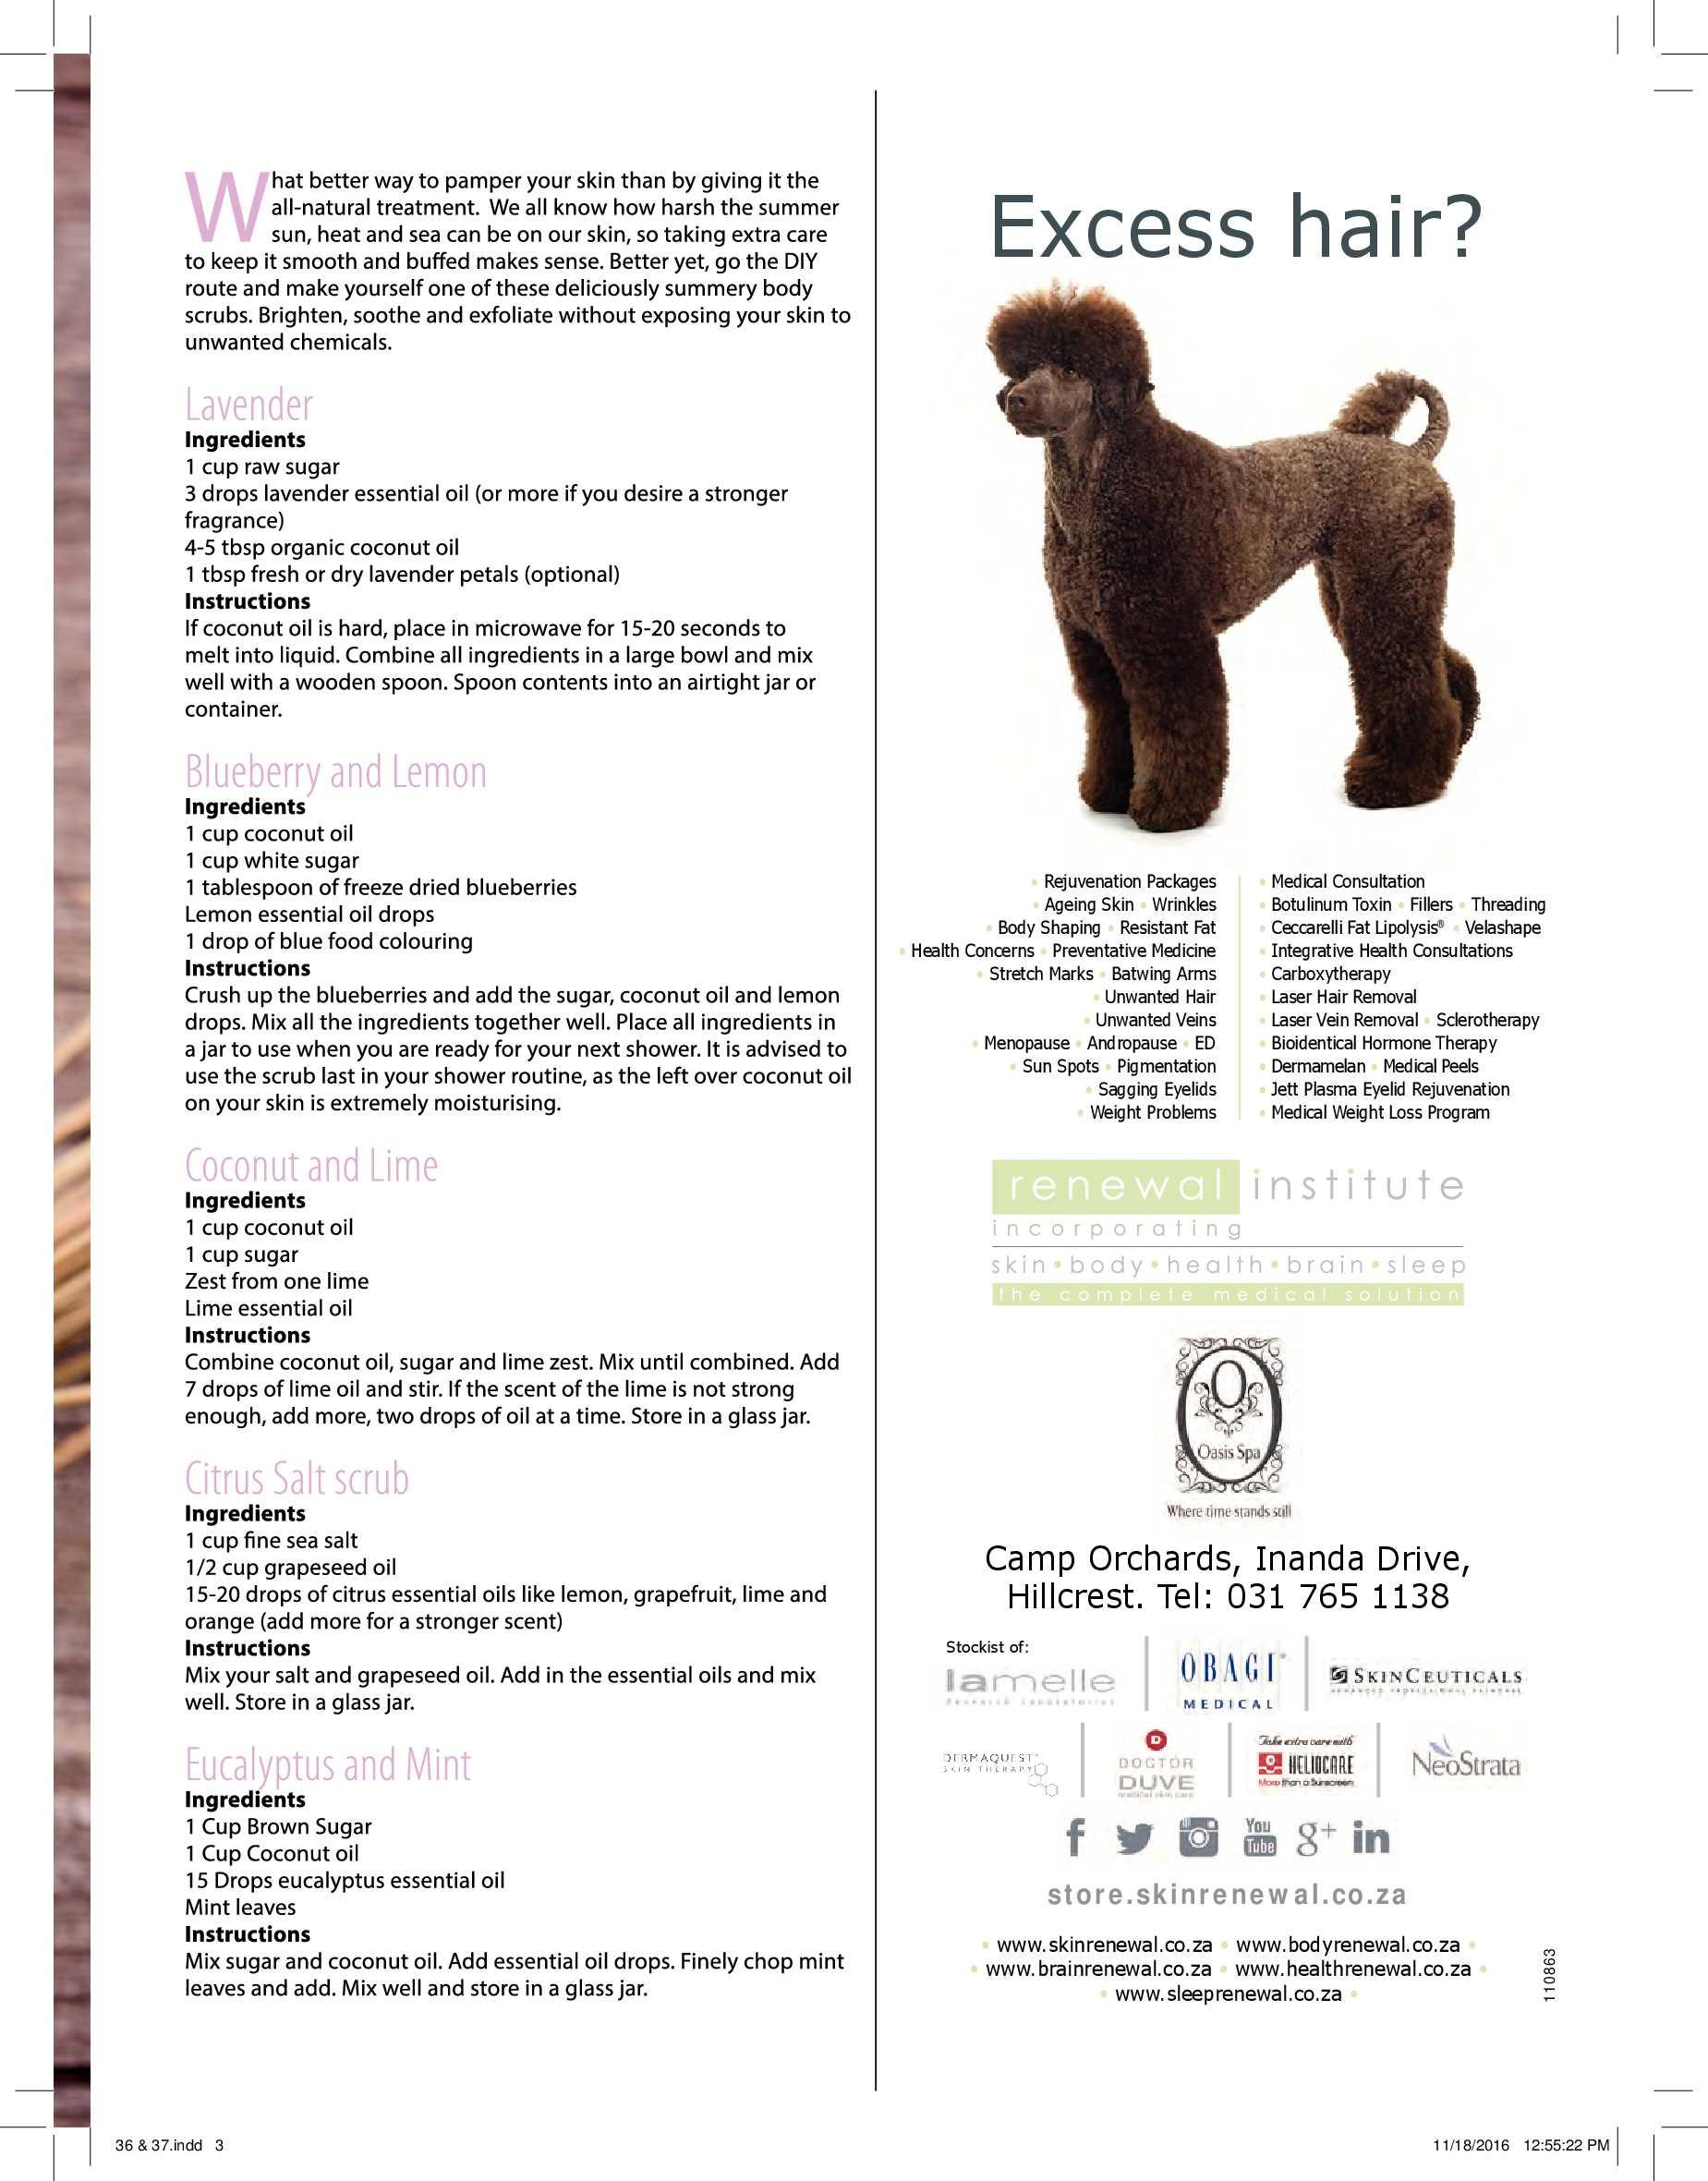 durban-get-it-magazine-december-2016-epapers-page-39